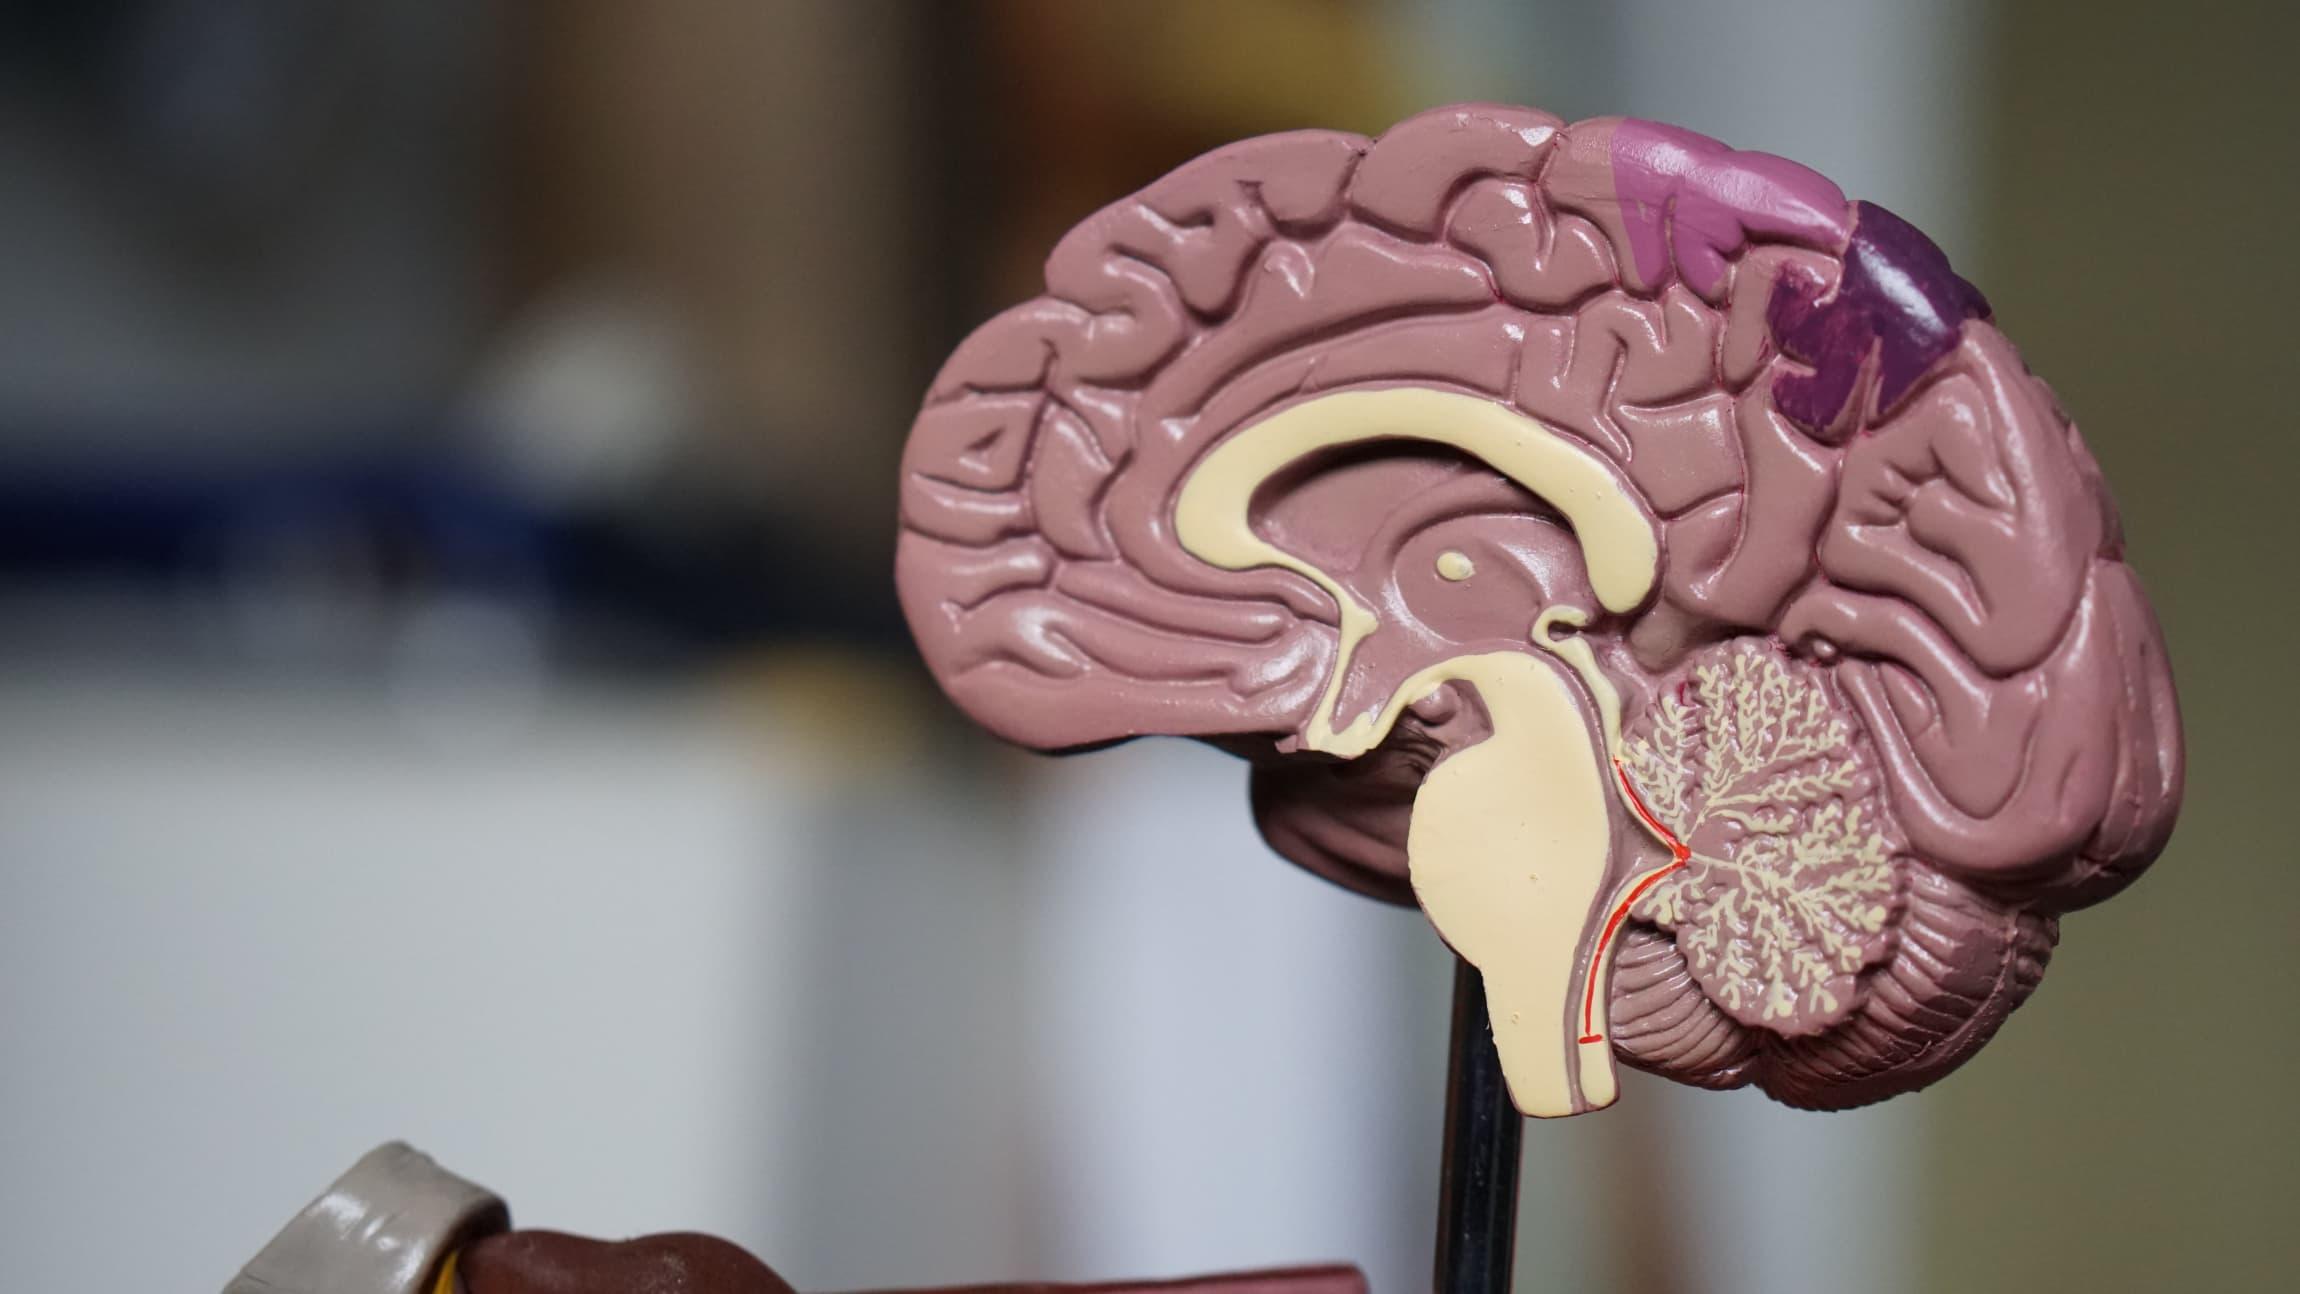 Medical model of the human brain.